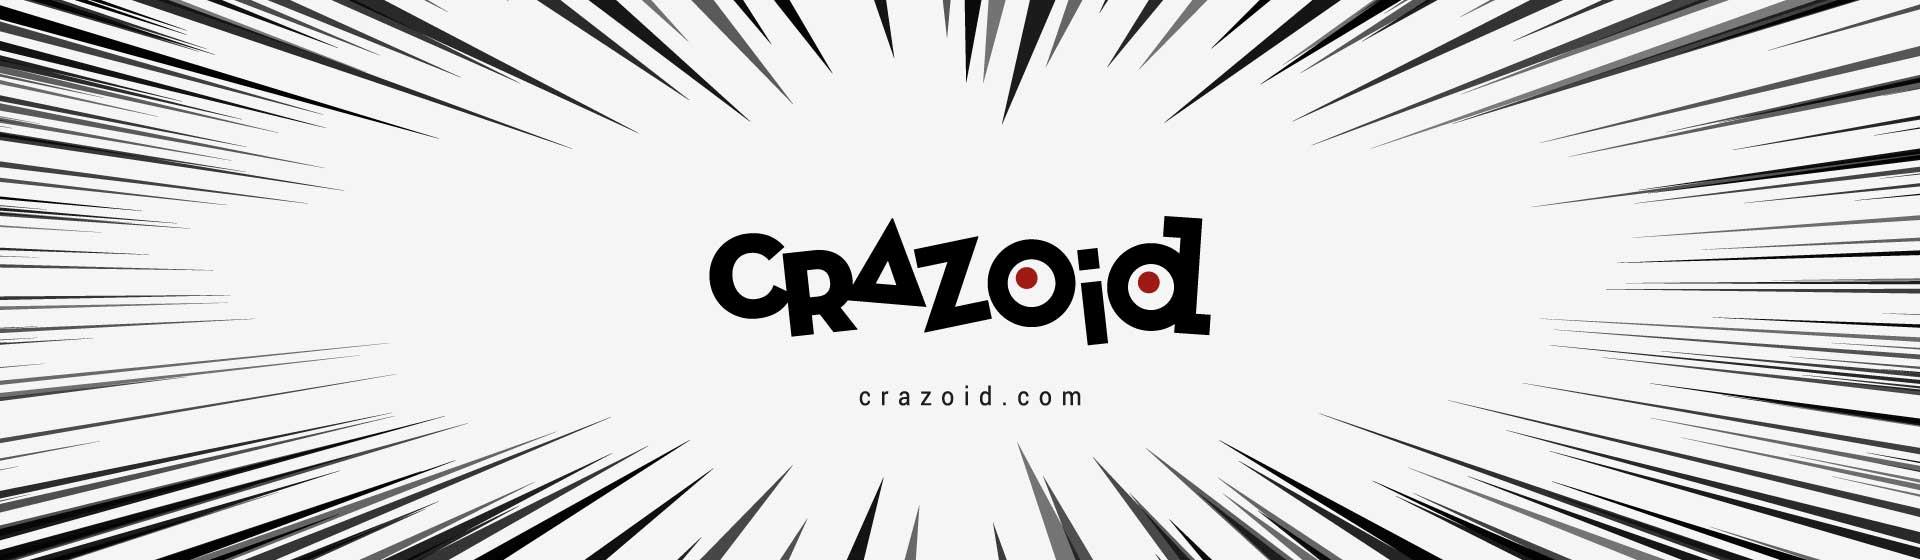 Crazoid.com - Brand Name design by Brandizle